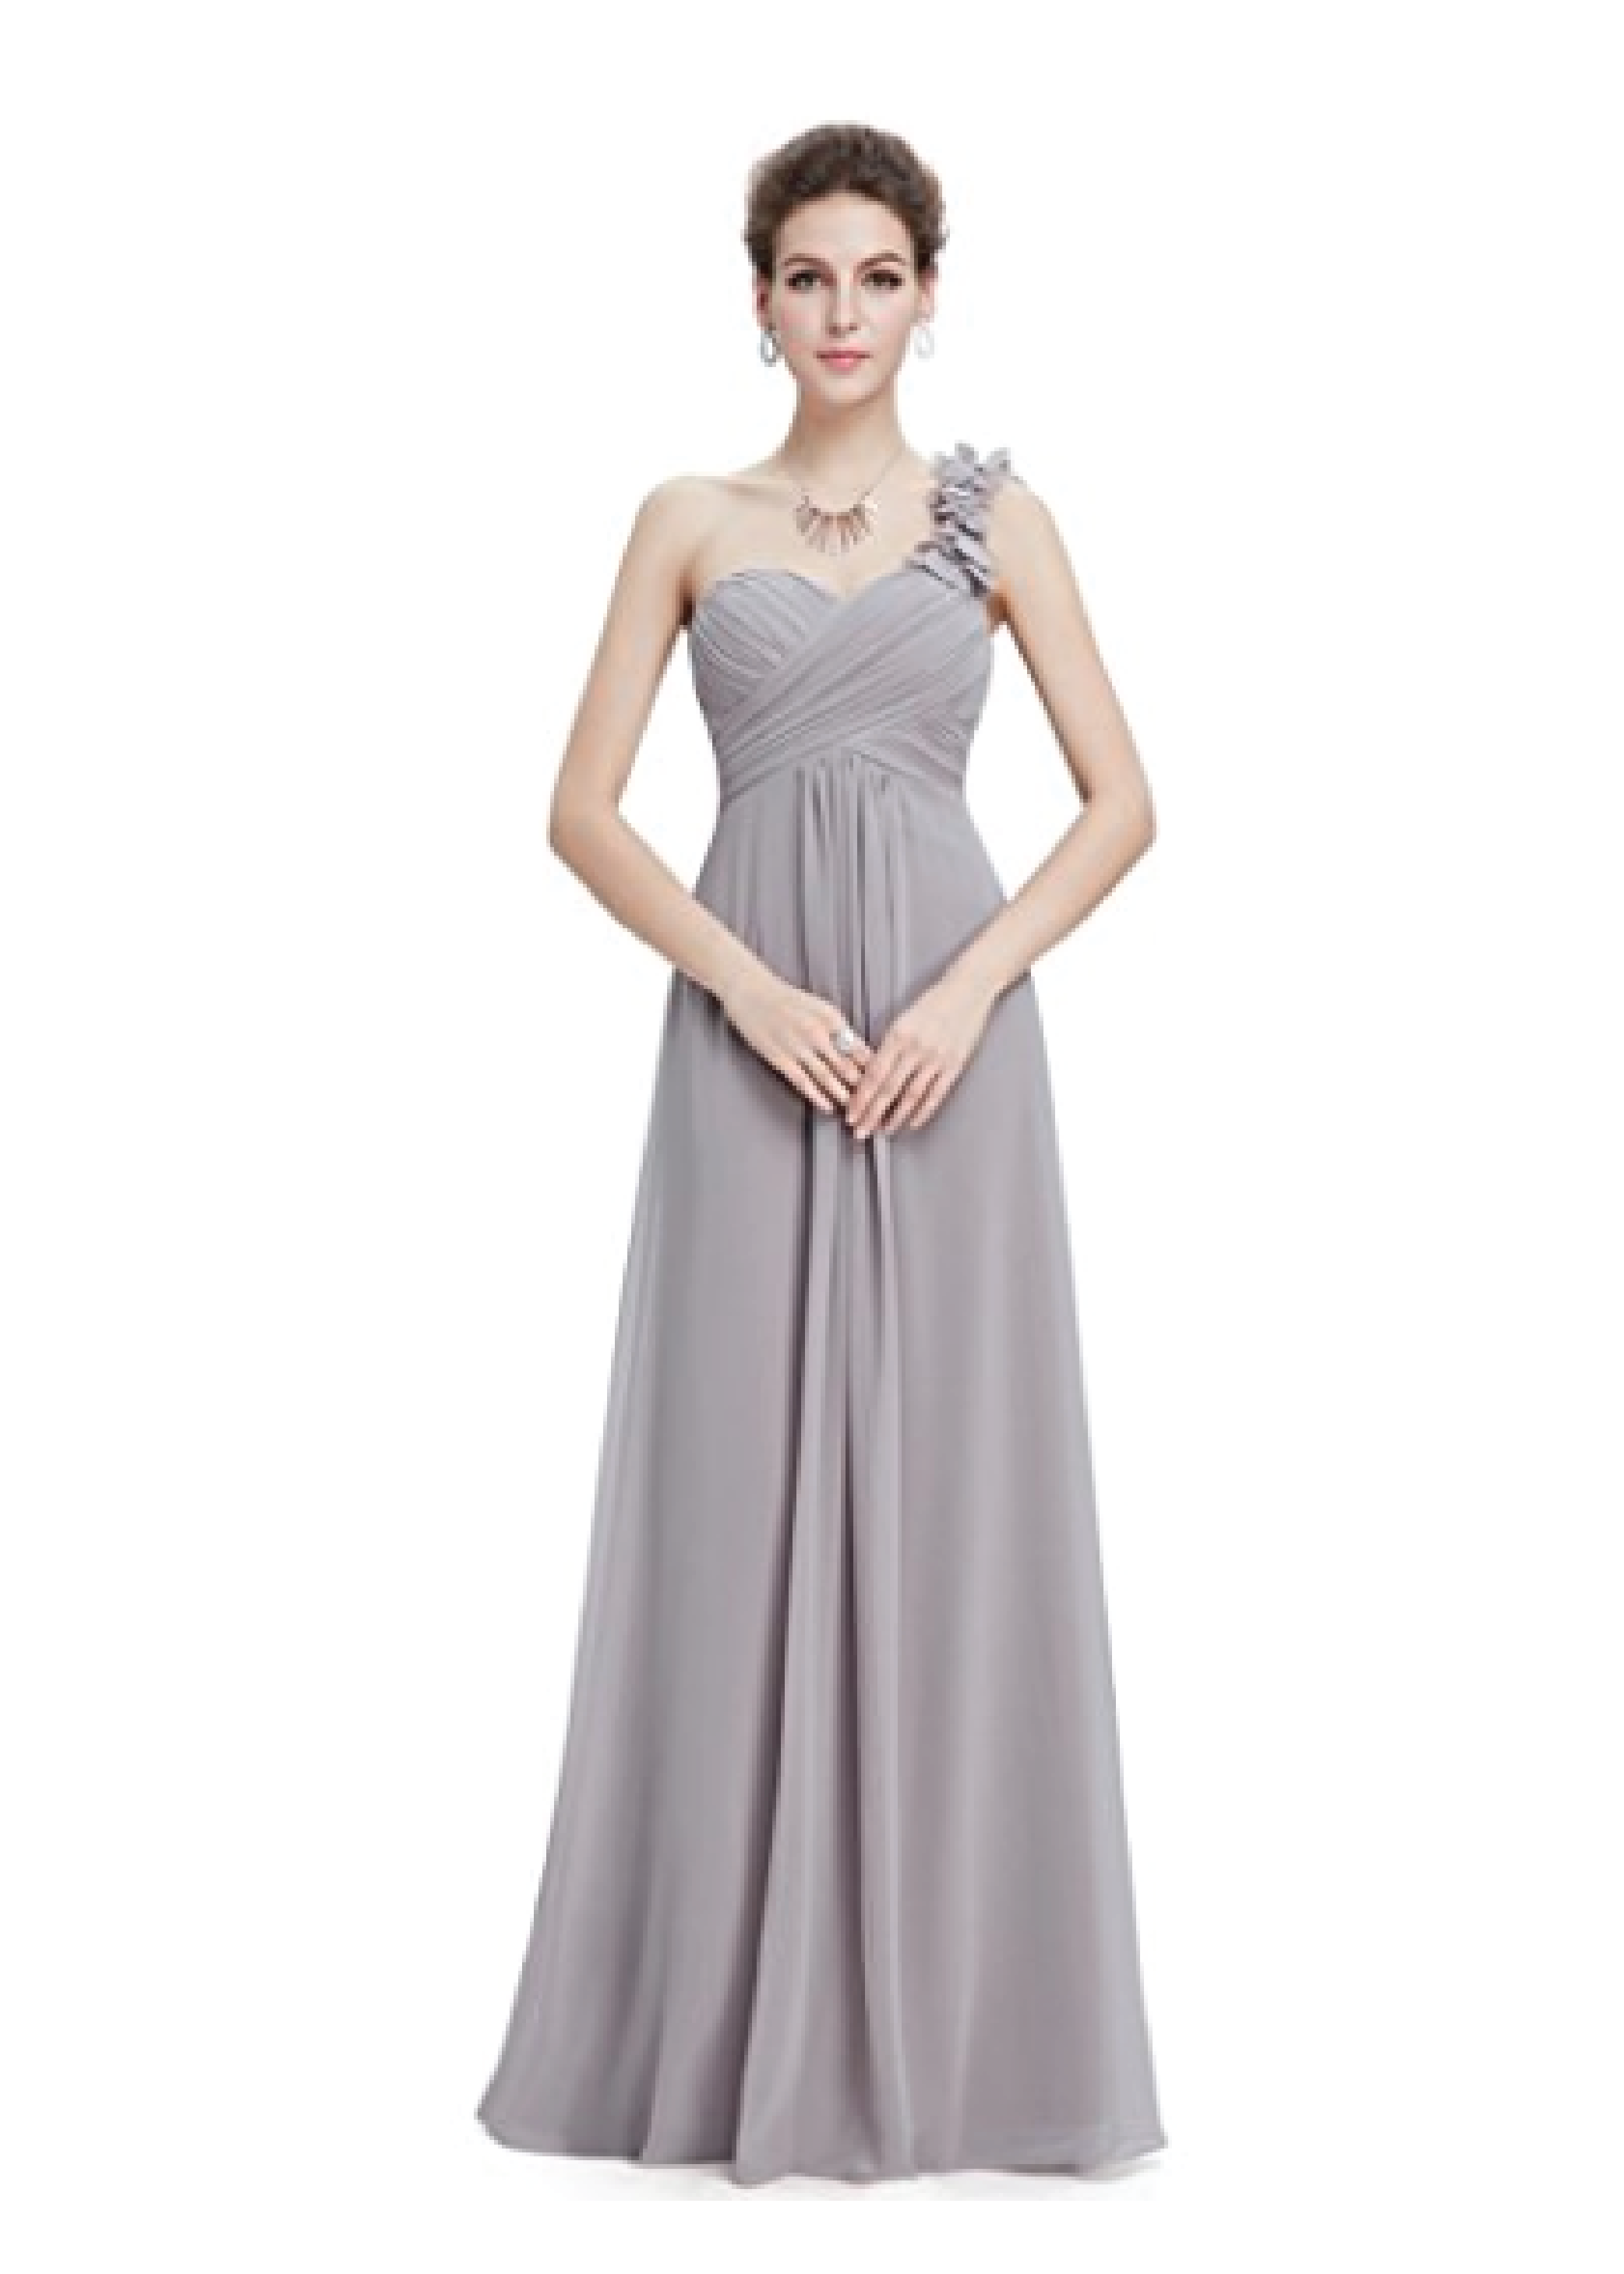 Top Bridesmaid Dresses Under 100-01.png